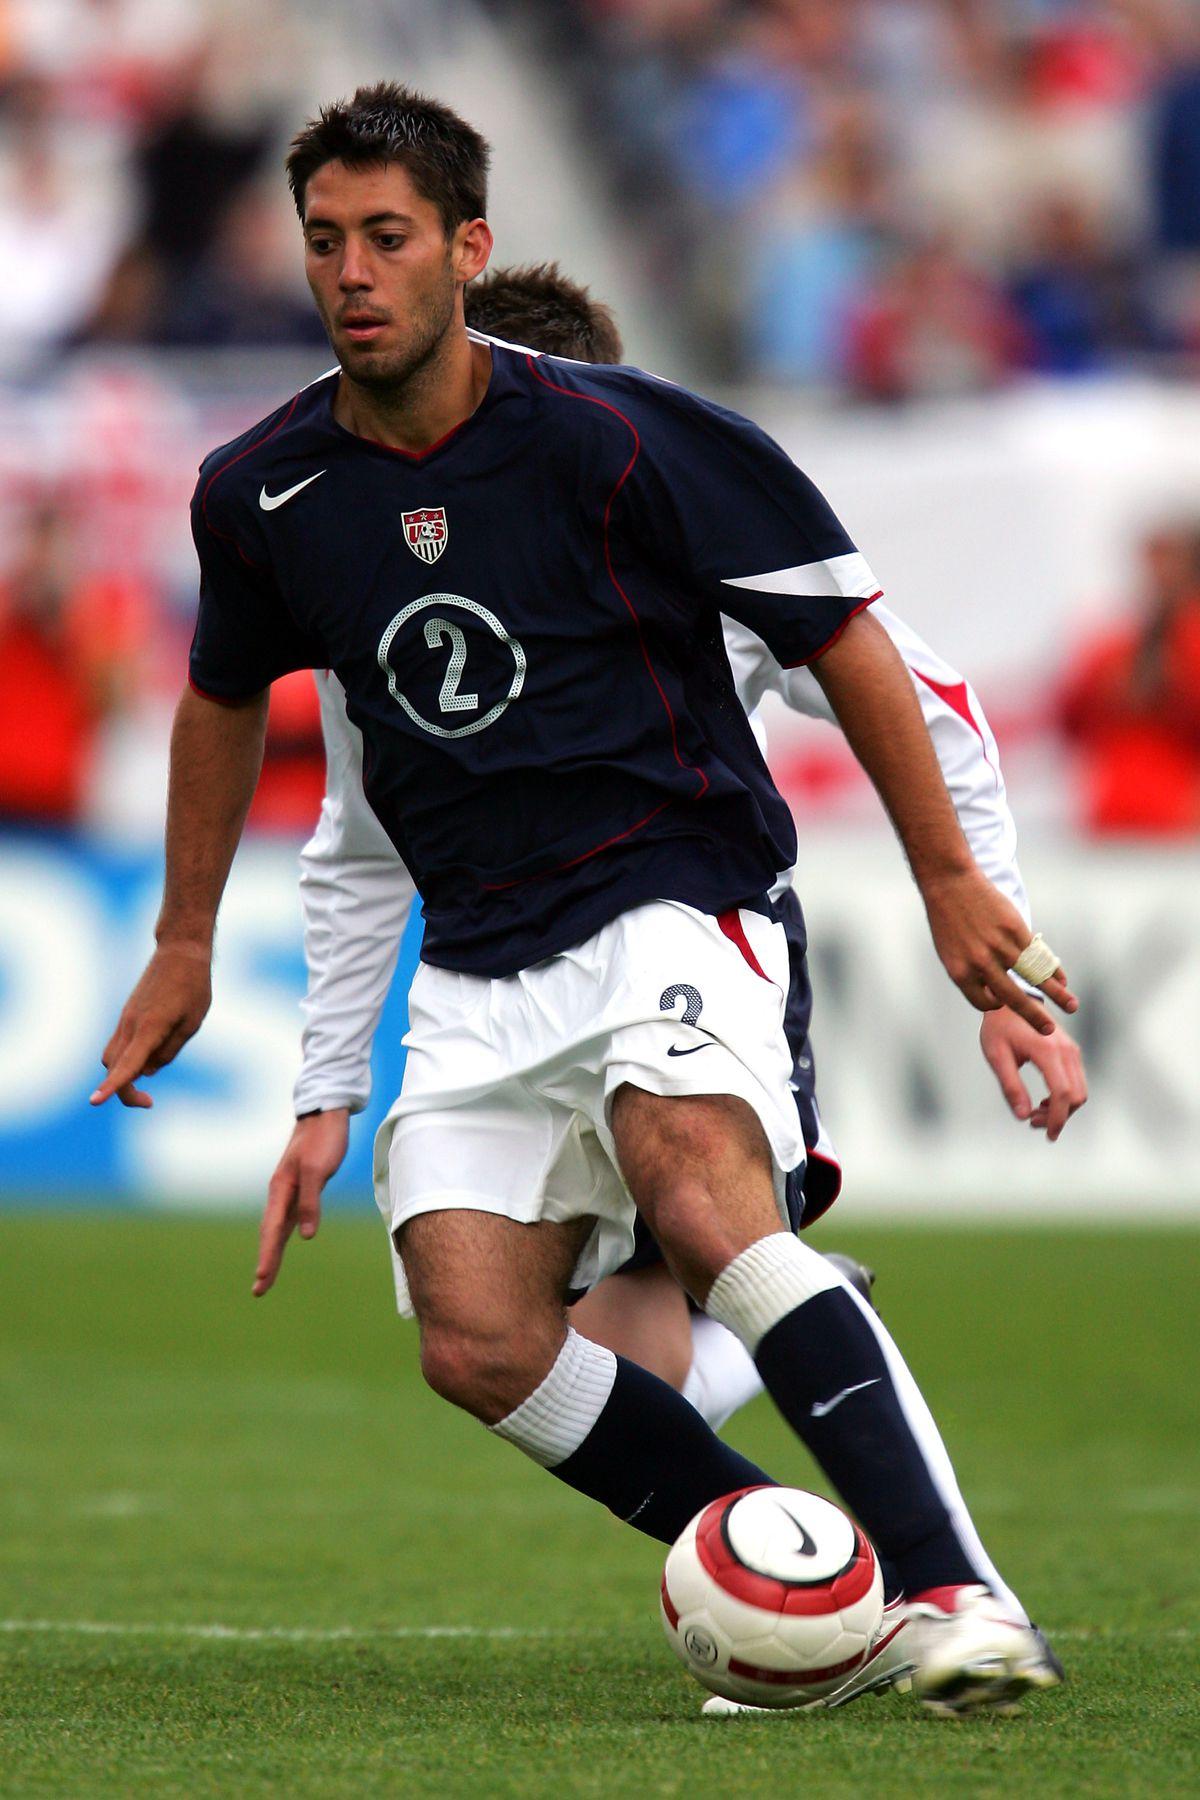 Soccer - International Friendly - USA v England - Soldier Field Stadium